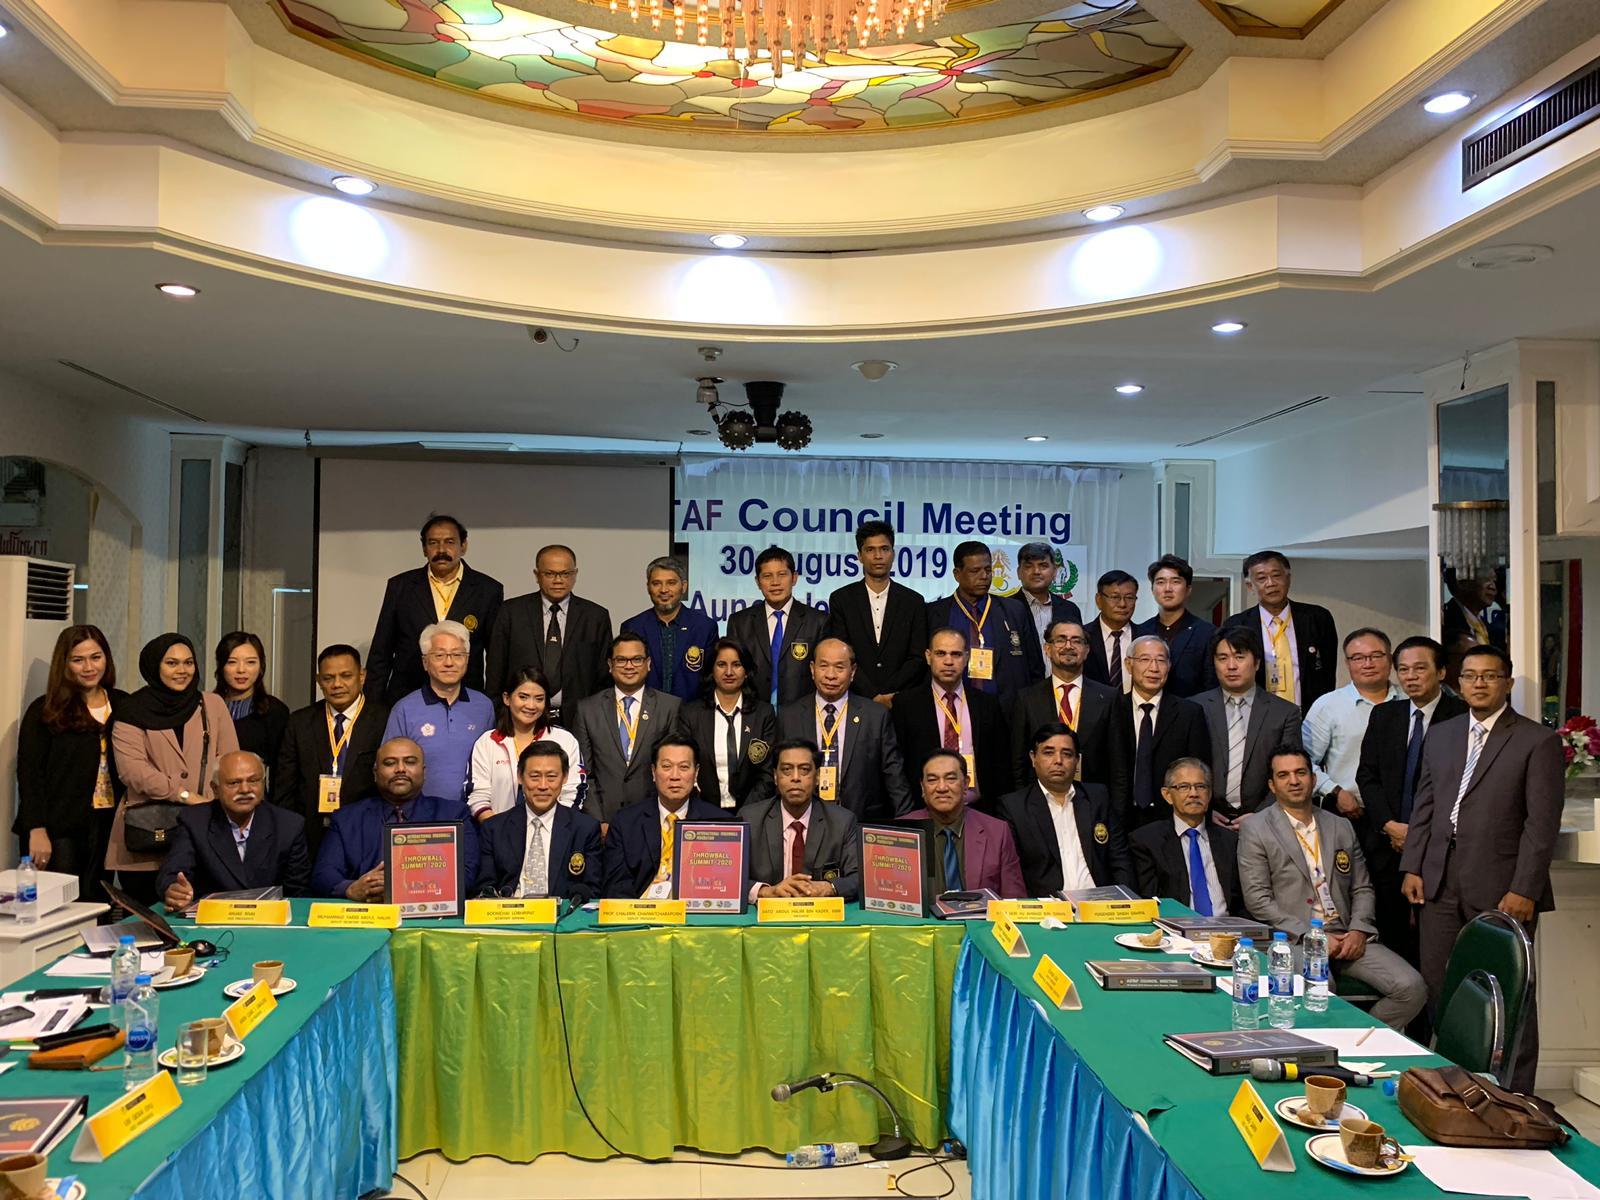 Federation members